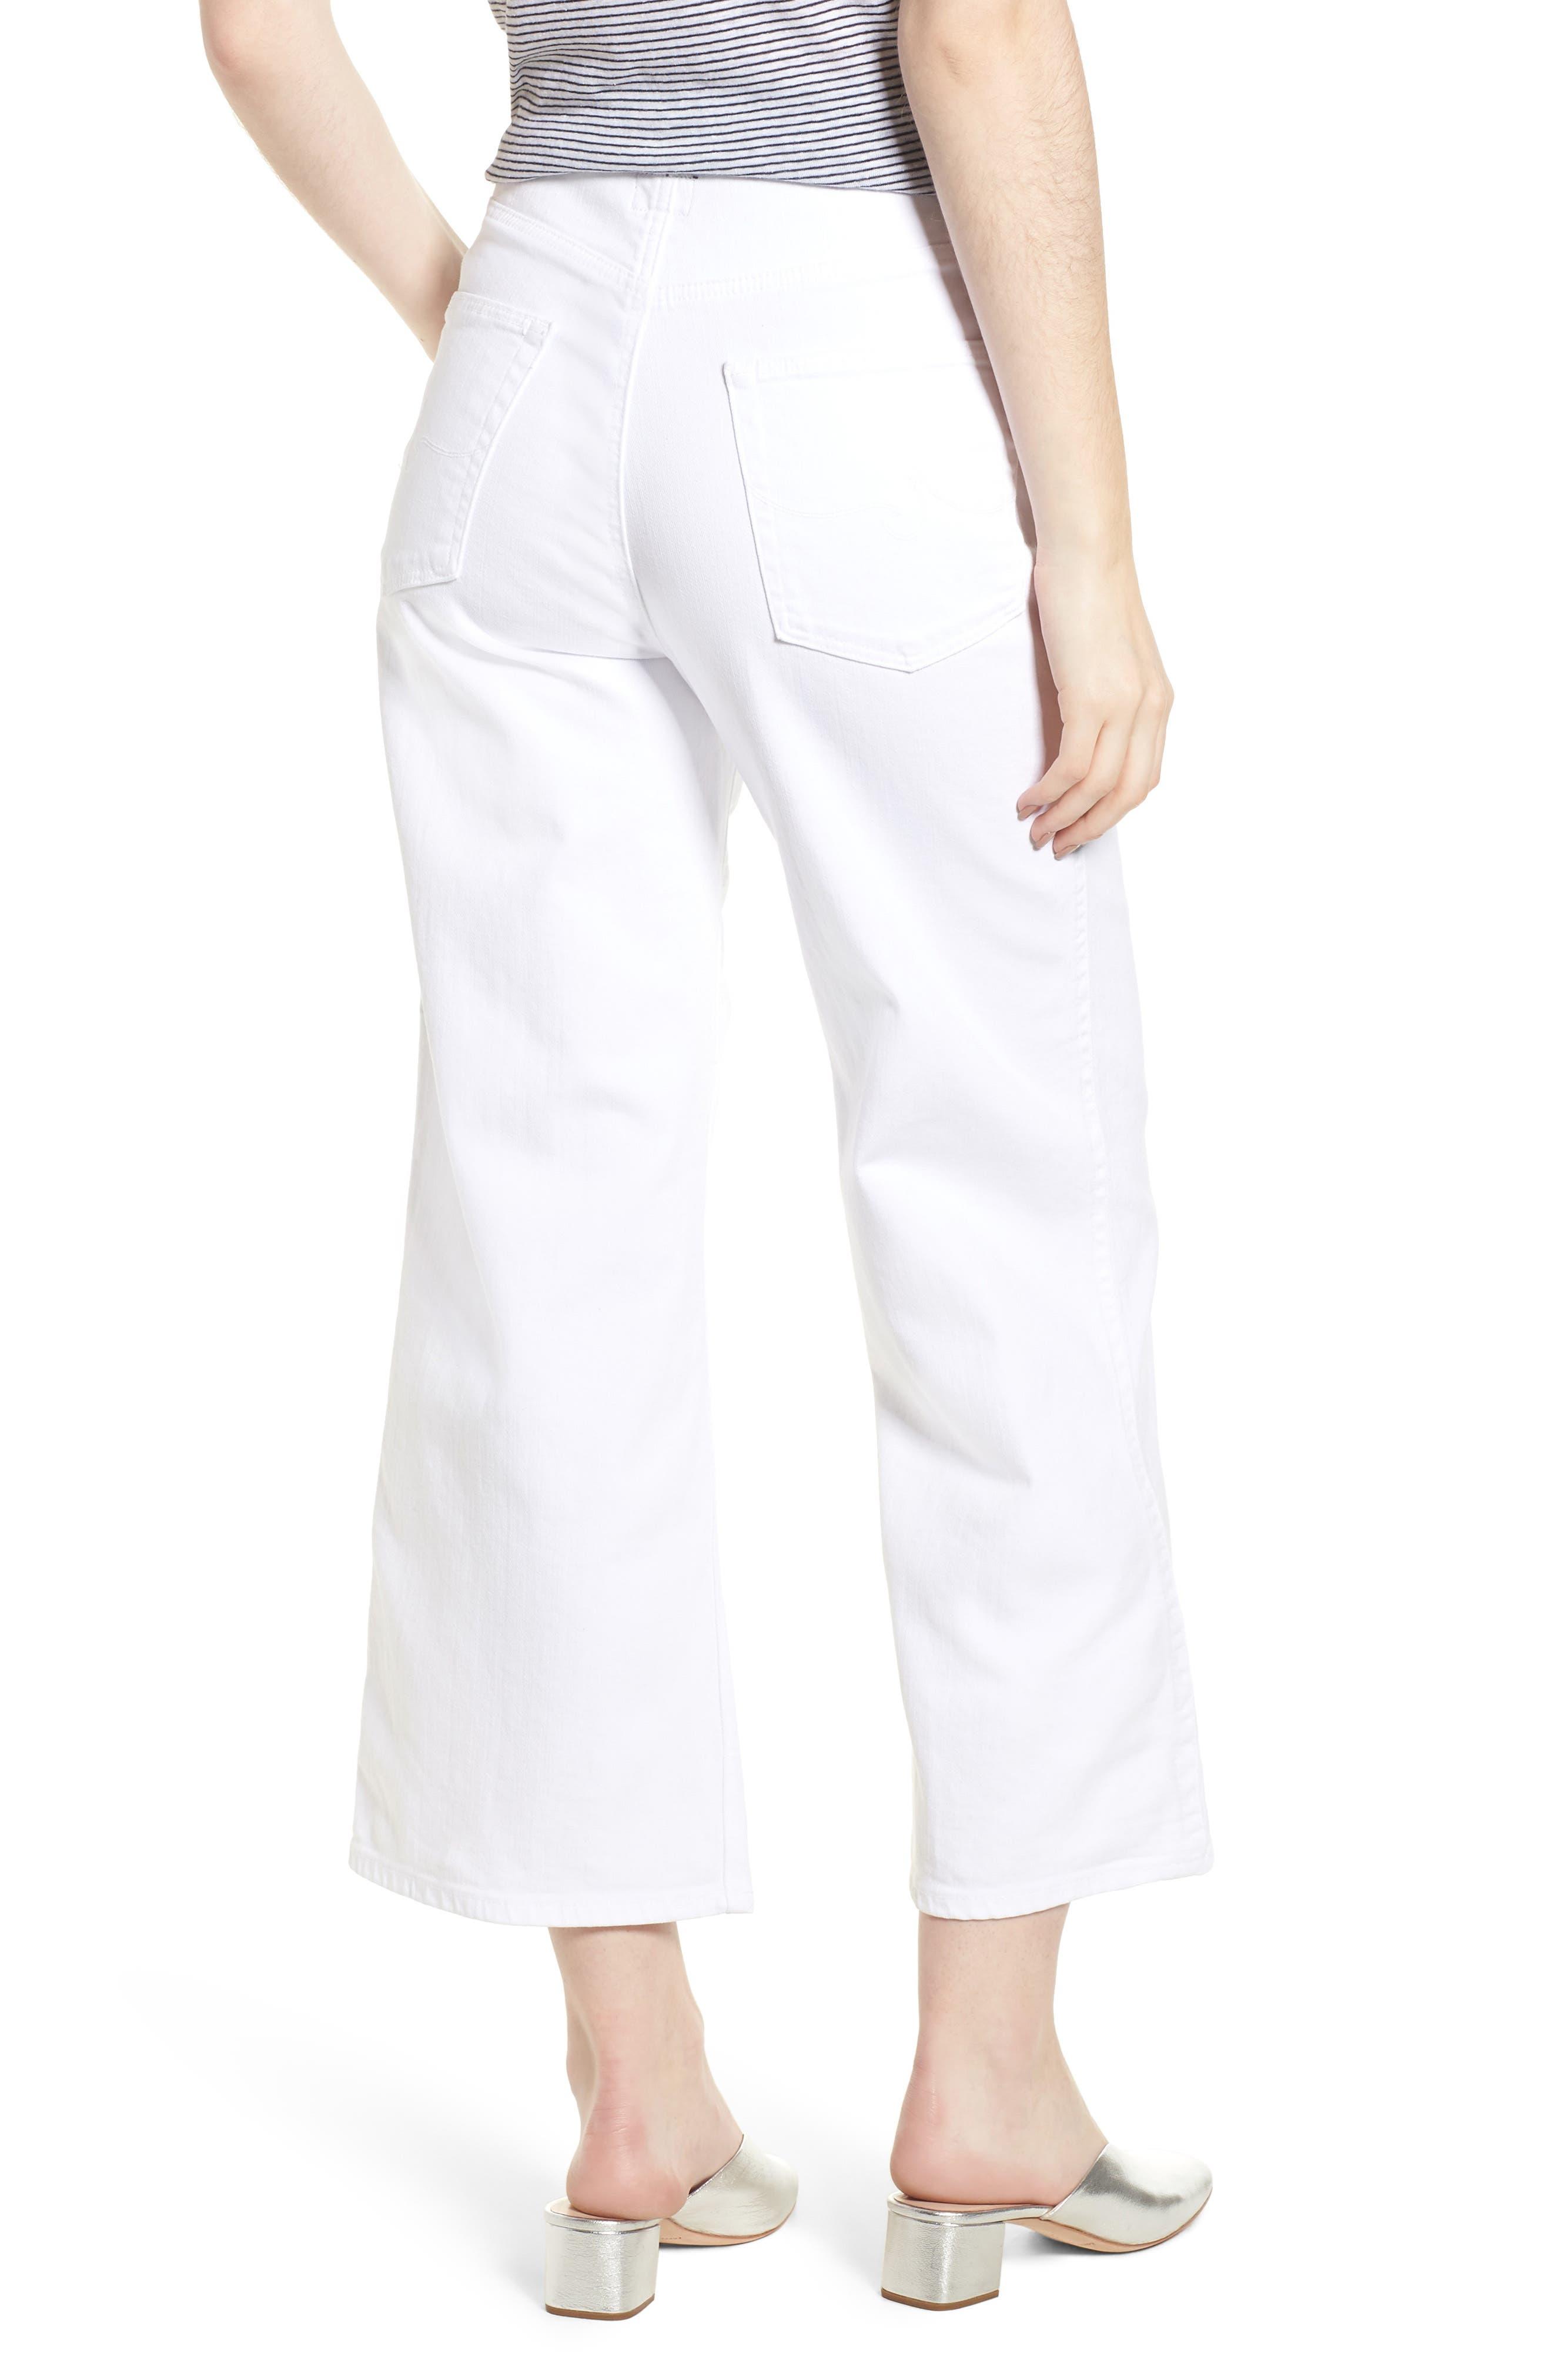 Etta High Waist Crop Wide Leg Jeans,                             Alternate thumbnail 2, color,                             White